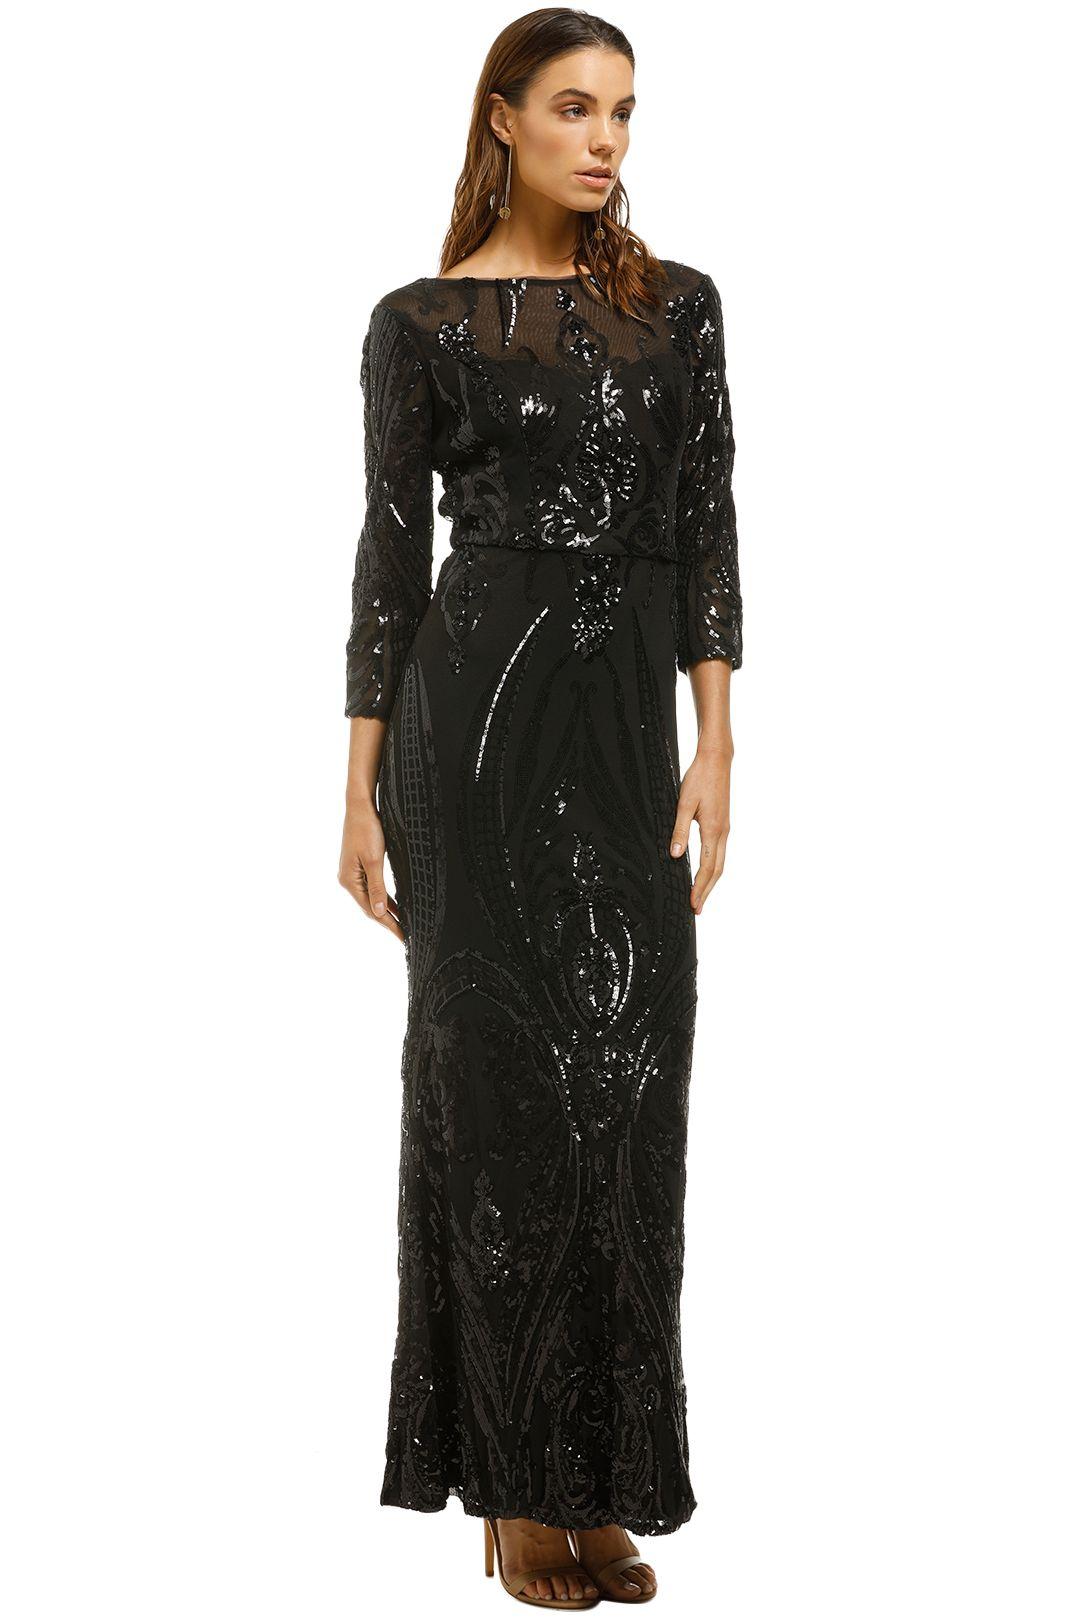 Cachet-Angelina Dress-Black-Side